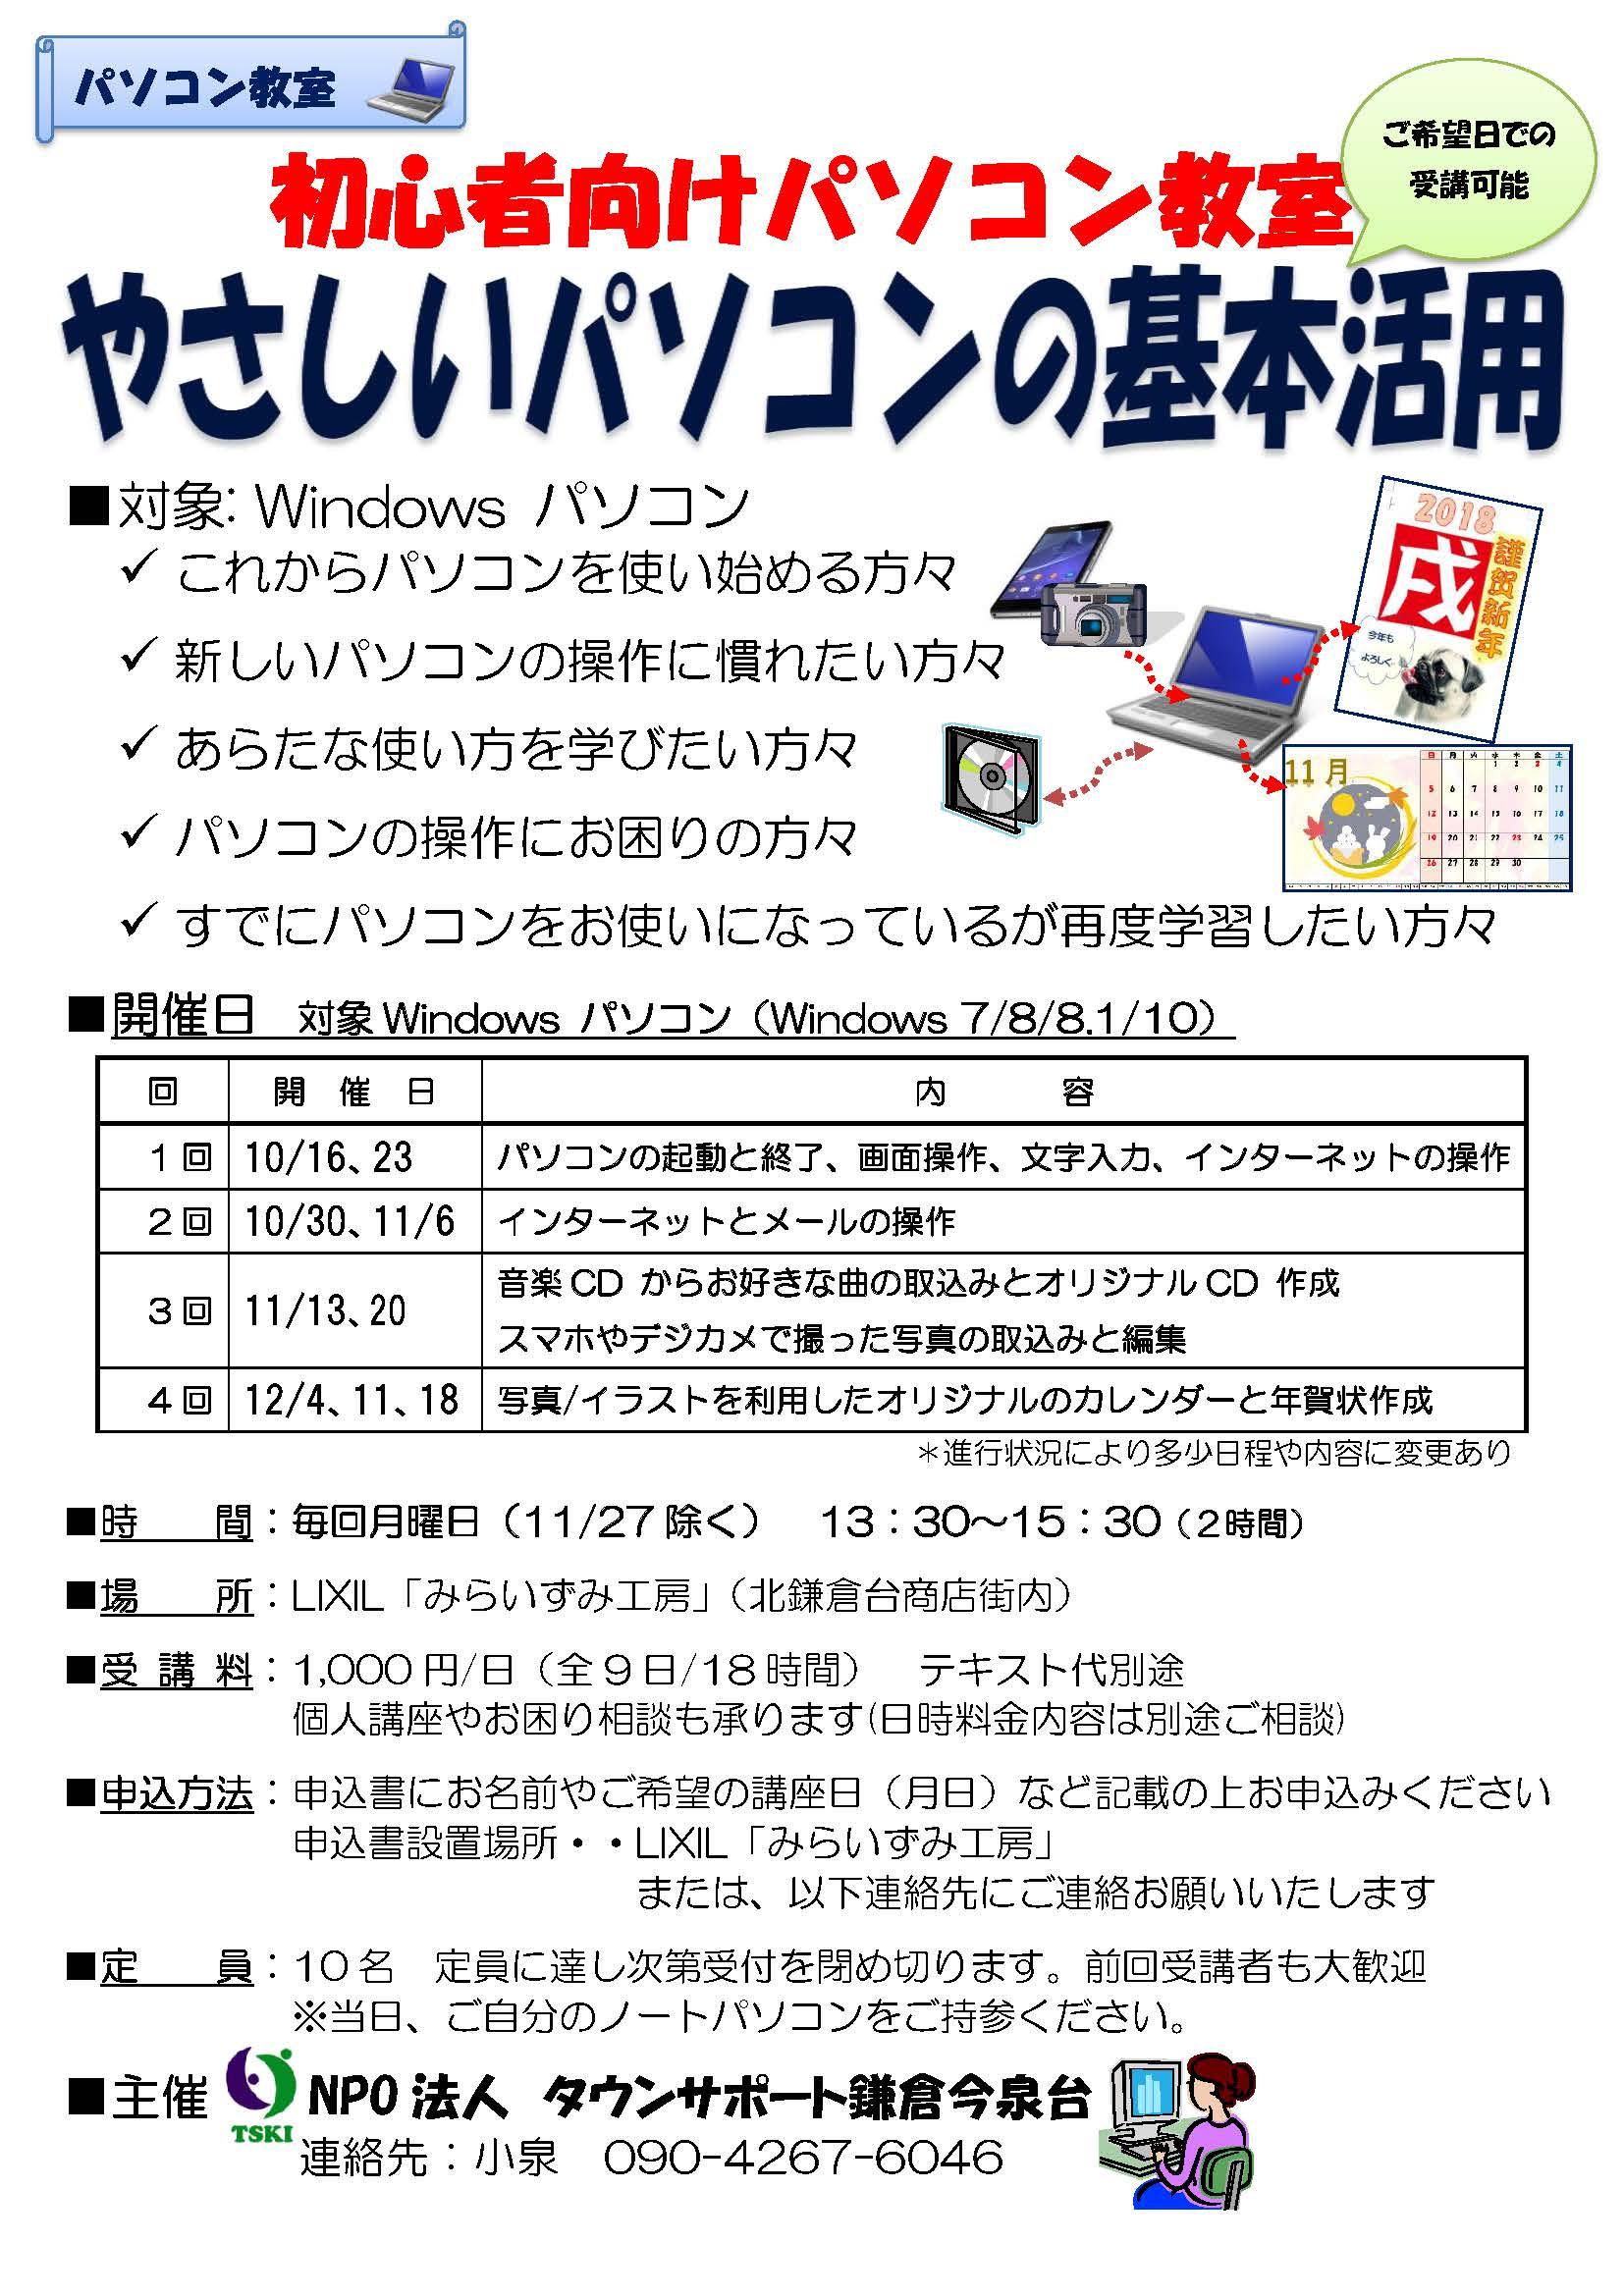 PC201710